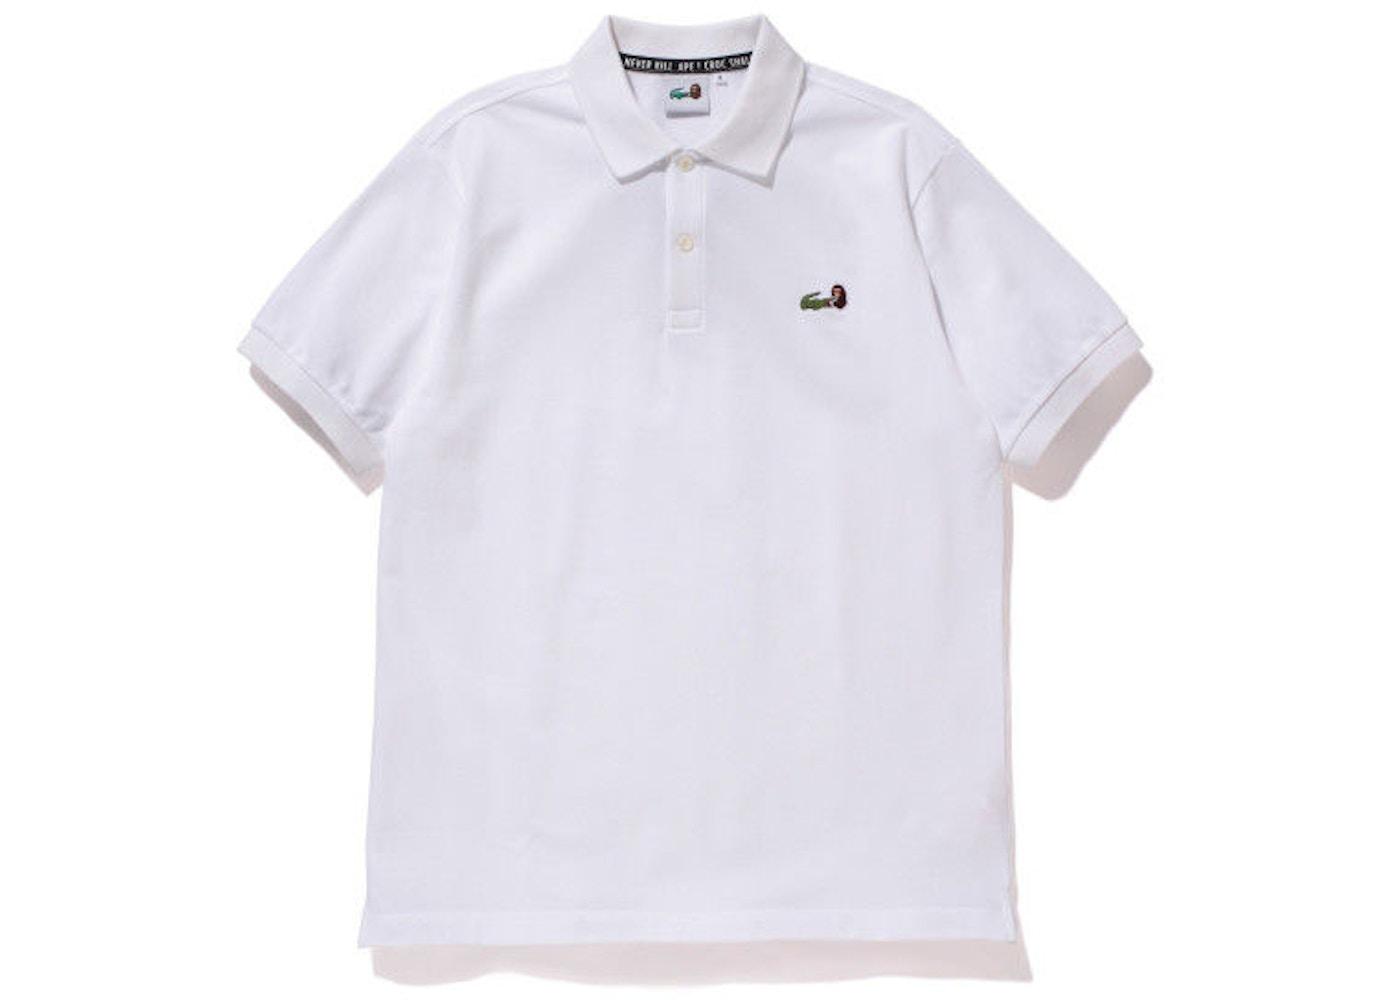 b8ef4e22 BAPE X Lacoste Embroidered Logo Polo Shirt White - SS15